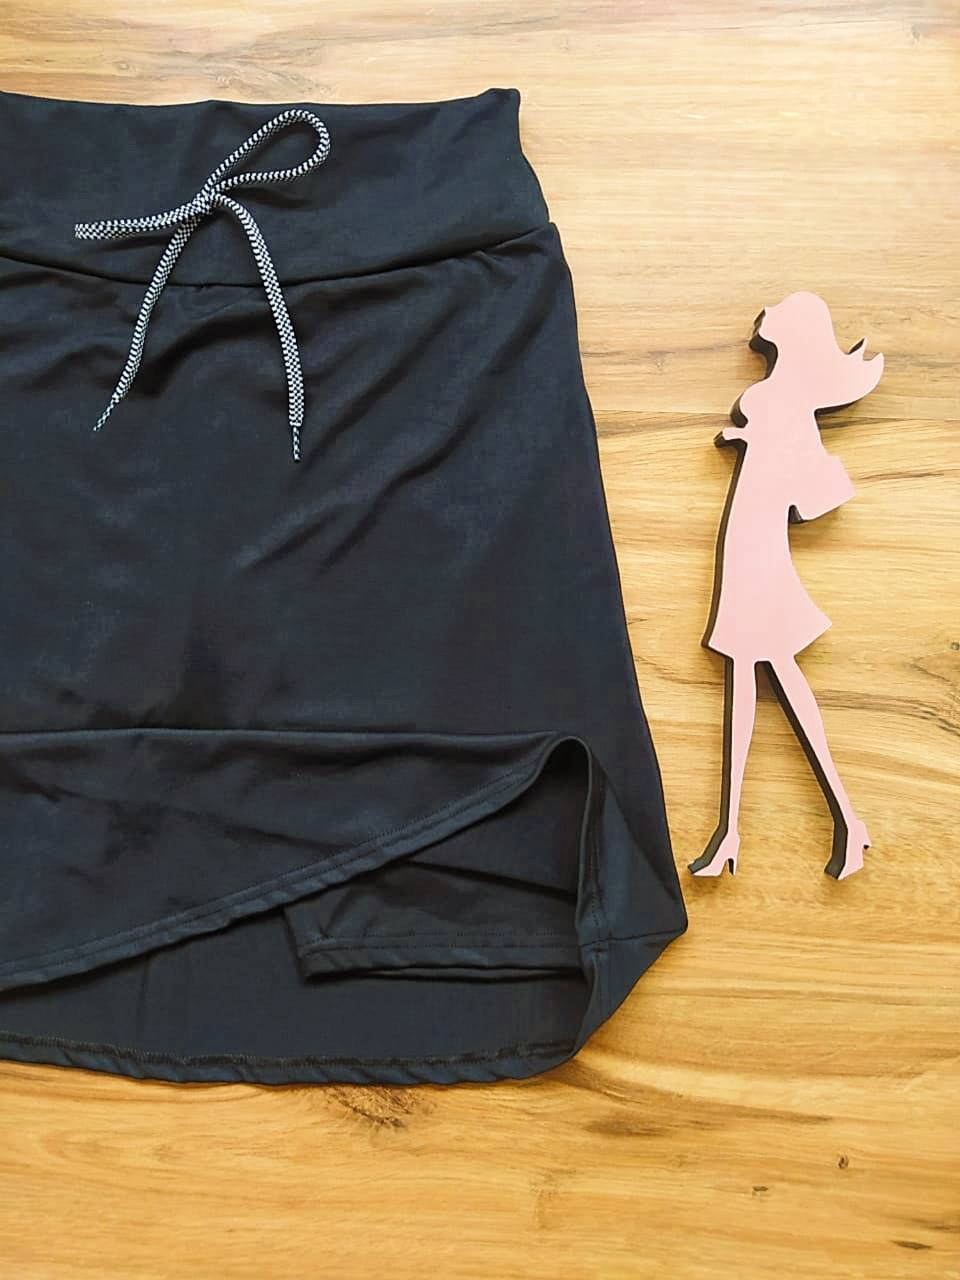 Saia Shorts Duda - Esporte Fitness Saia Bela - SBF001